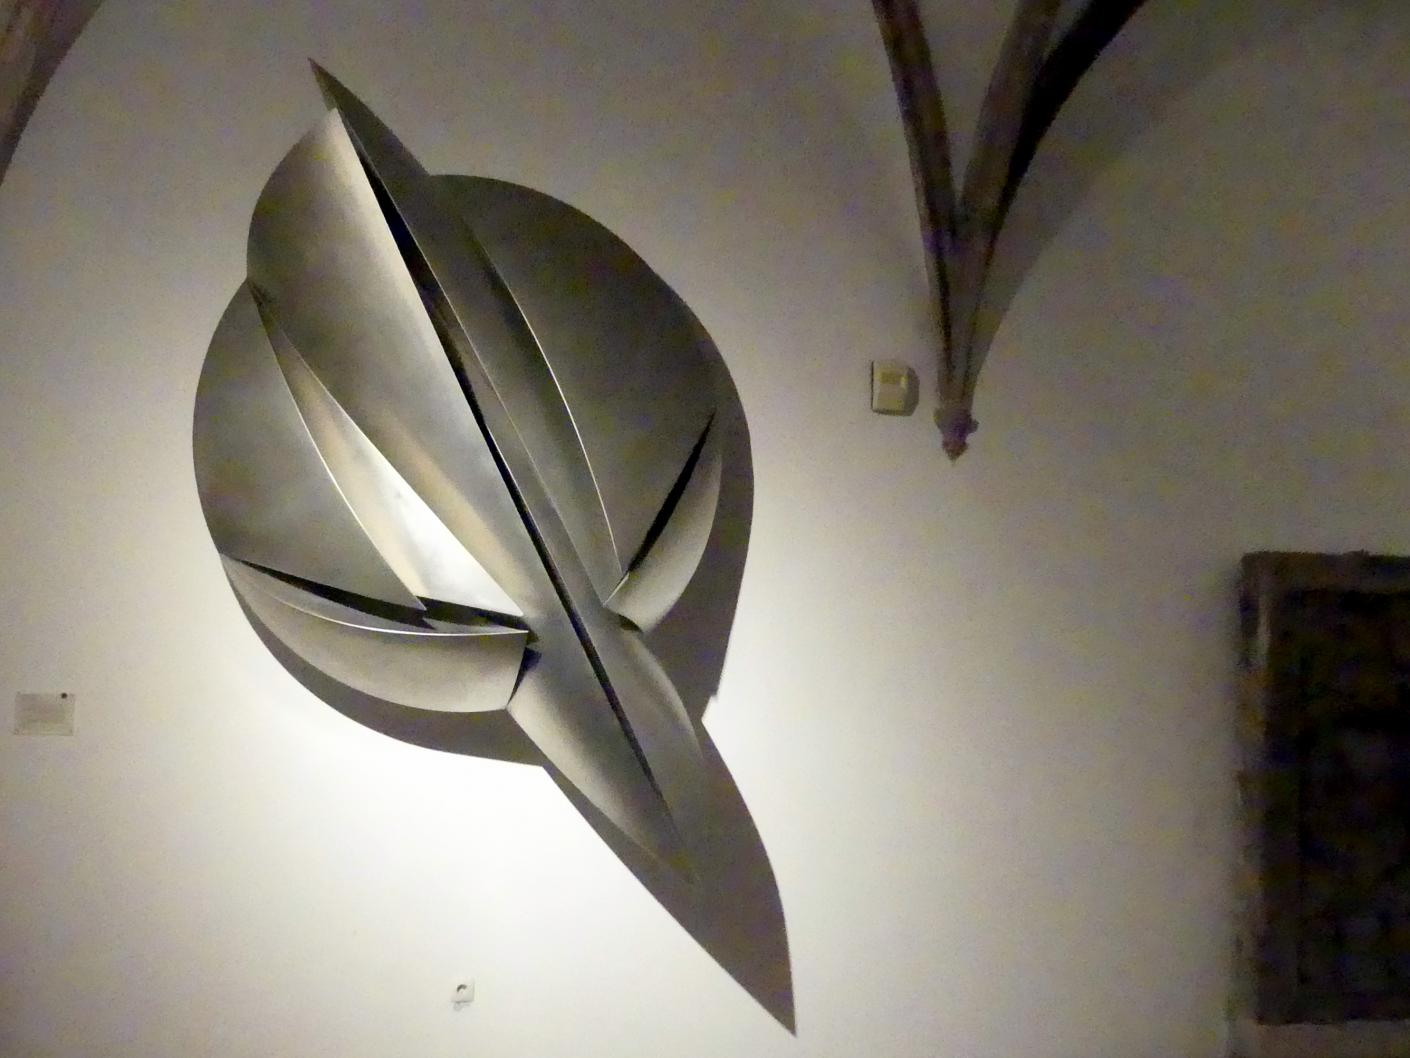 Erich Hauser: Stahlplastik 2/79, 1979